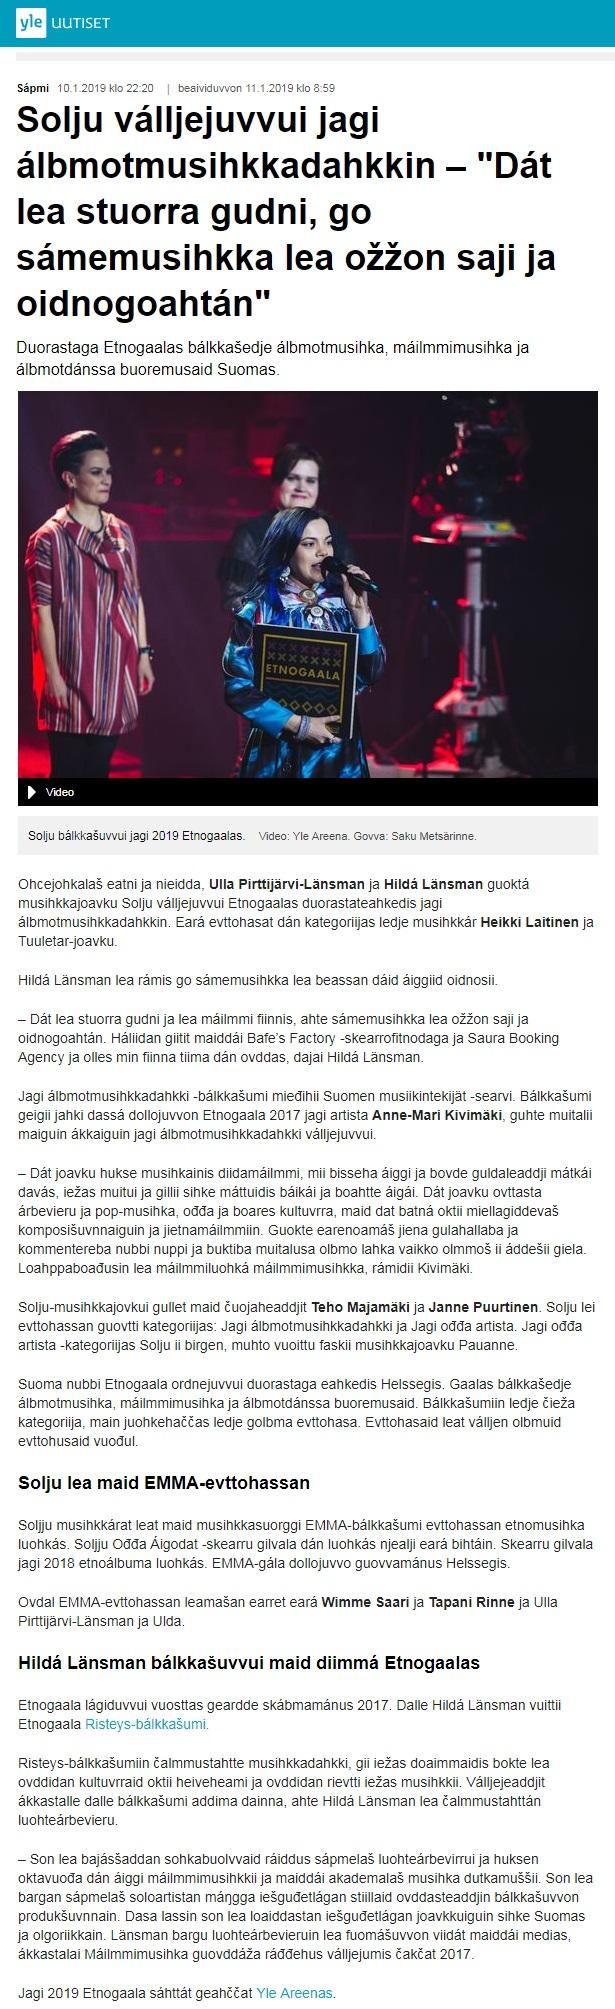 Yle Sápmi (Finland), 10.1.2019